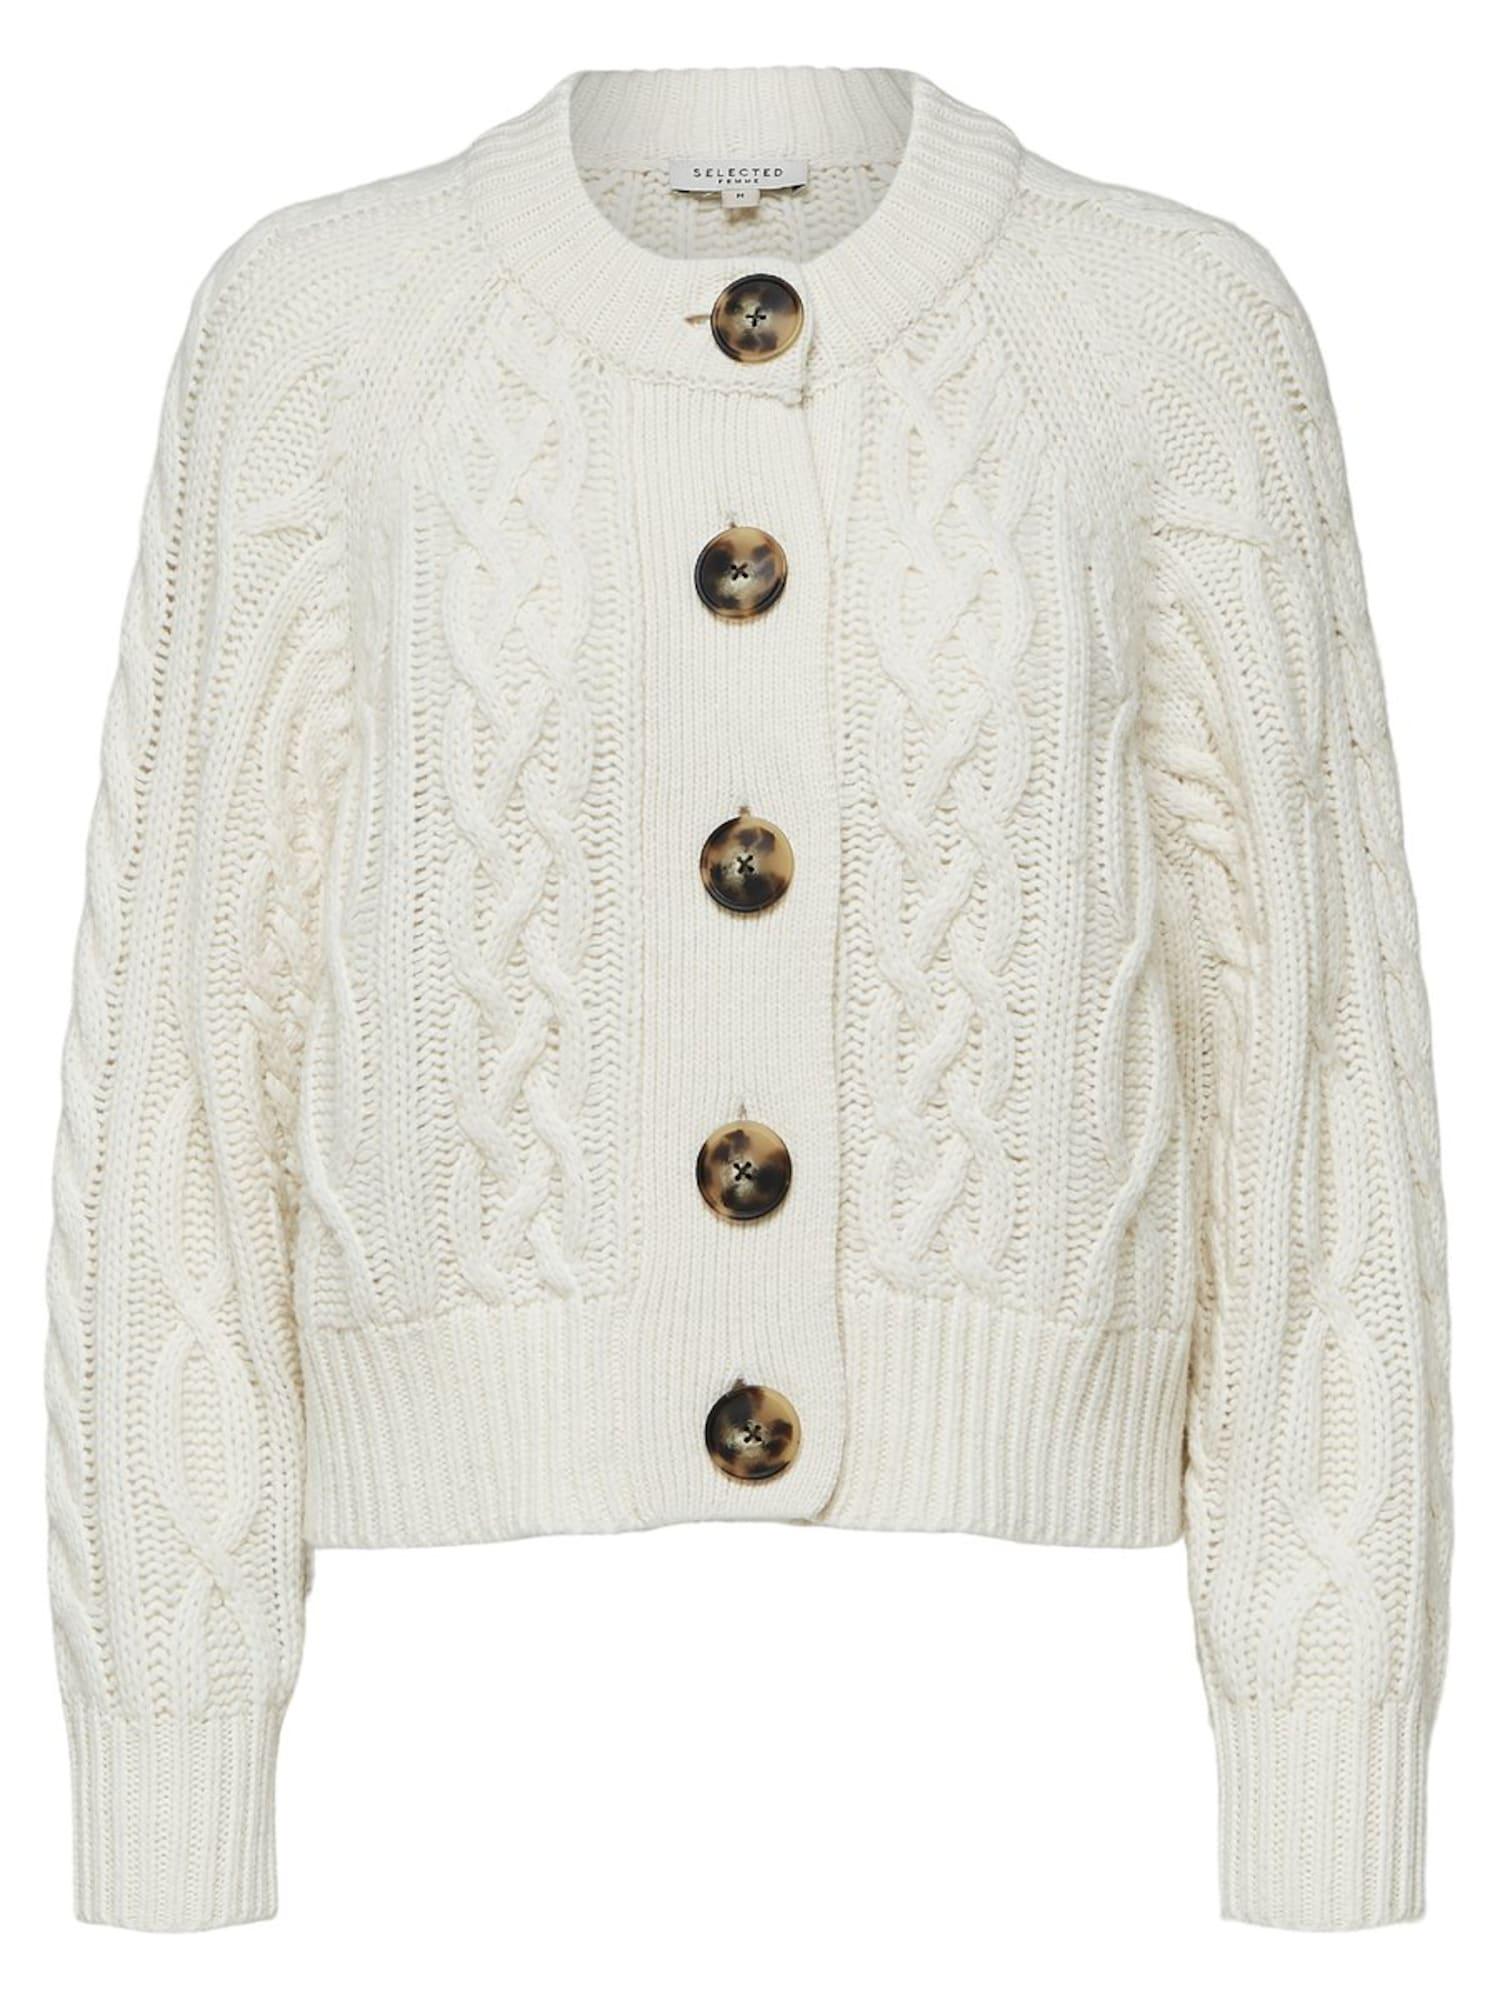 Strick-Cardigan | Bekleidung > Pullover | Weiß | Selected Femme